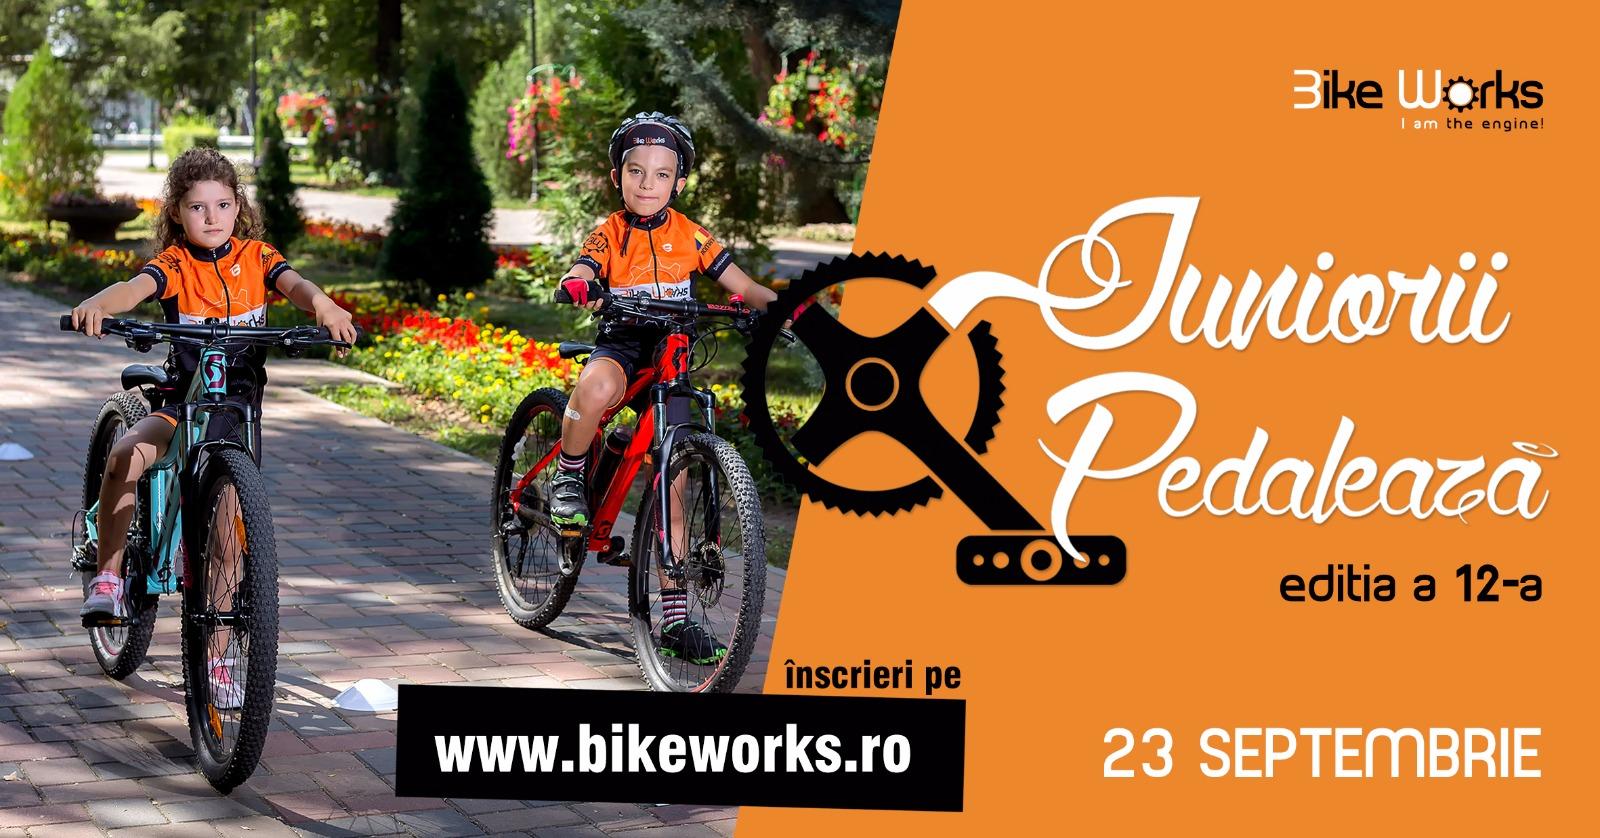 Indemanare si bicicleta – J.P. editia nr.12